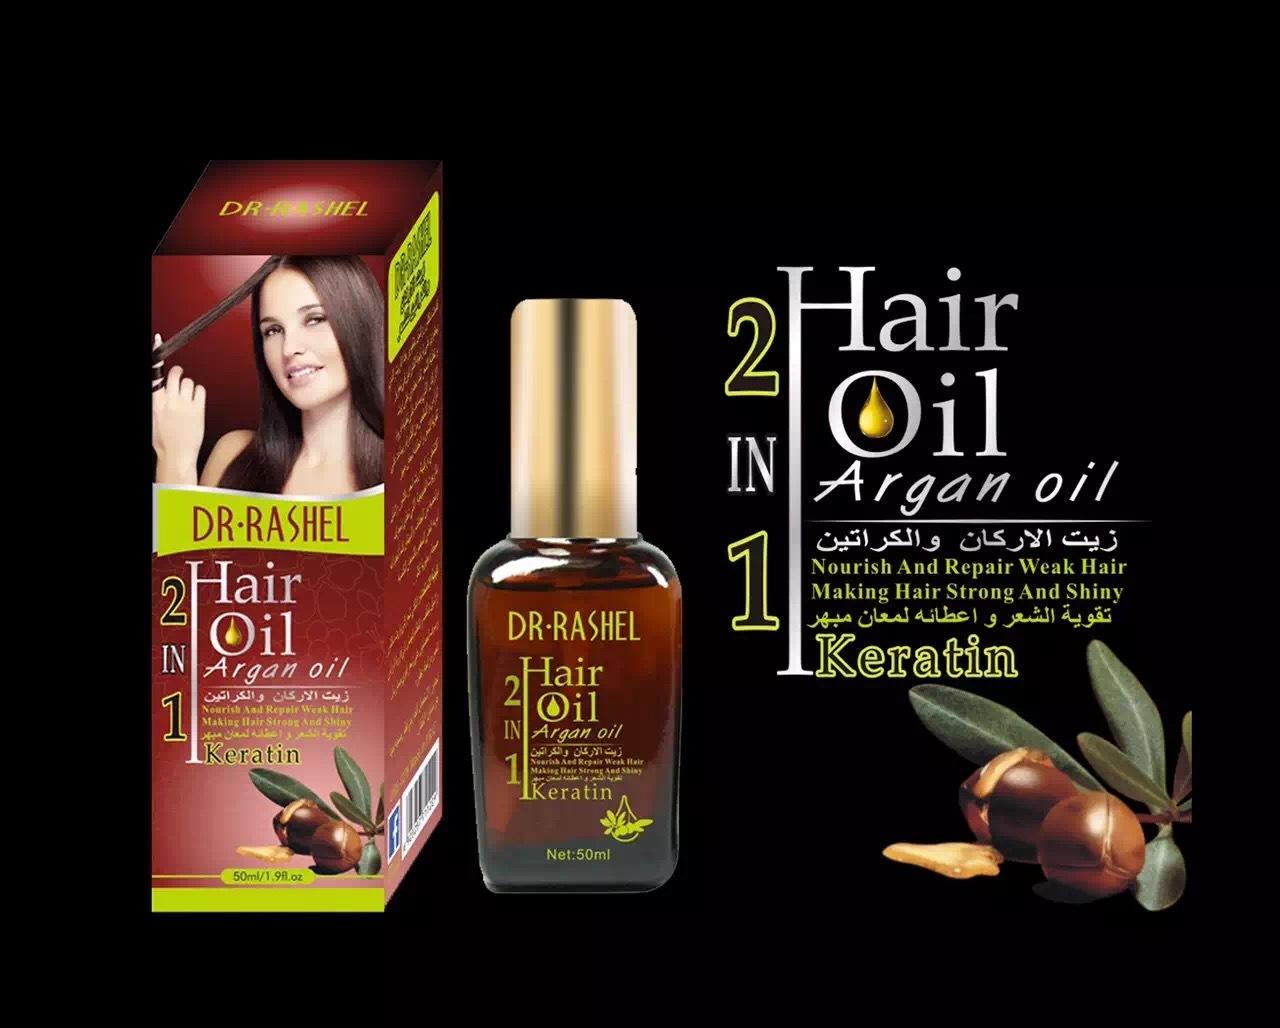 rashel argan oil moroccan hair essential oil hair care nutrition hair keratin treatment nut oil